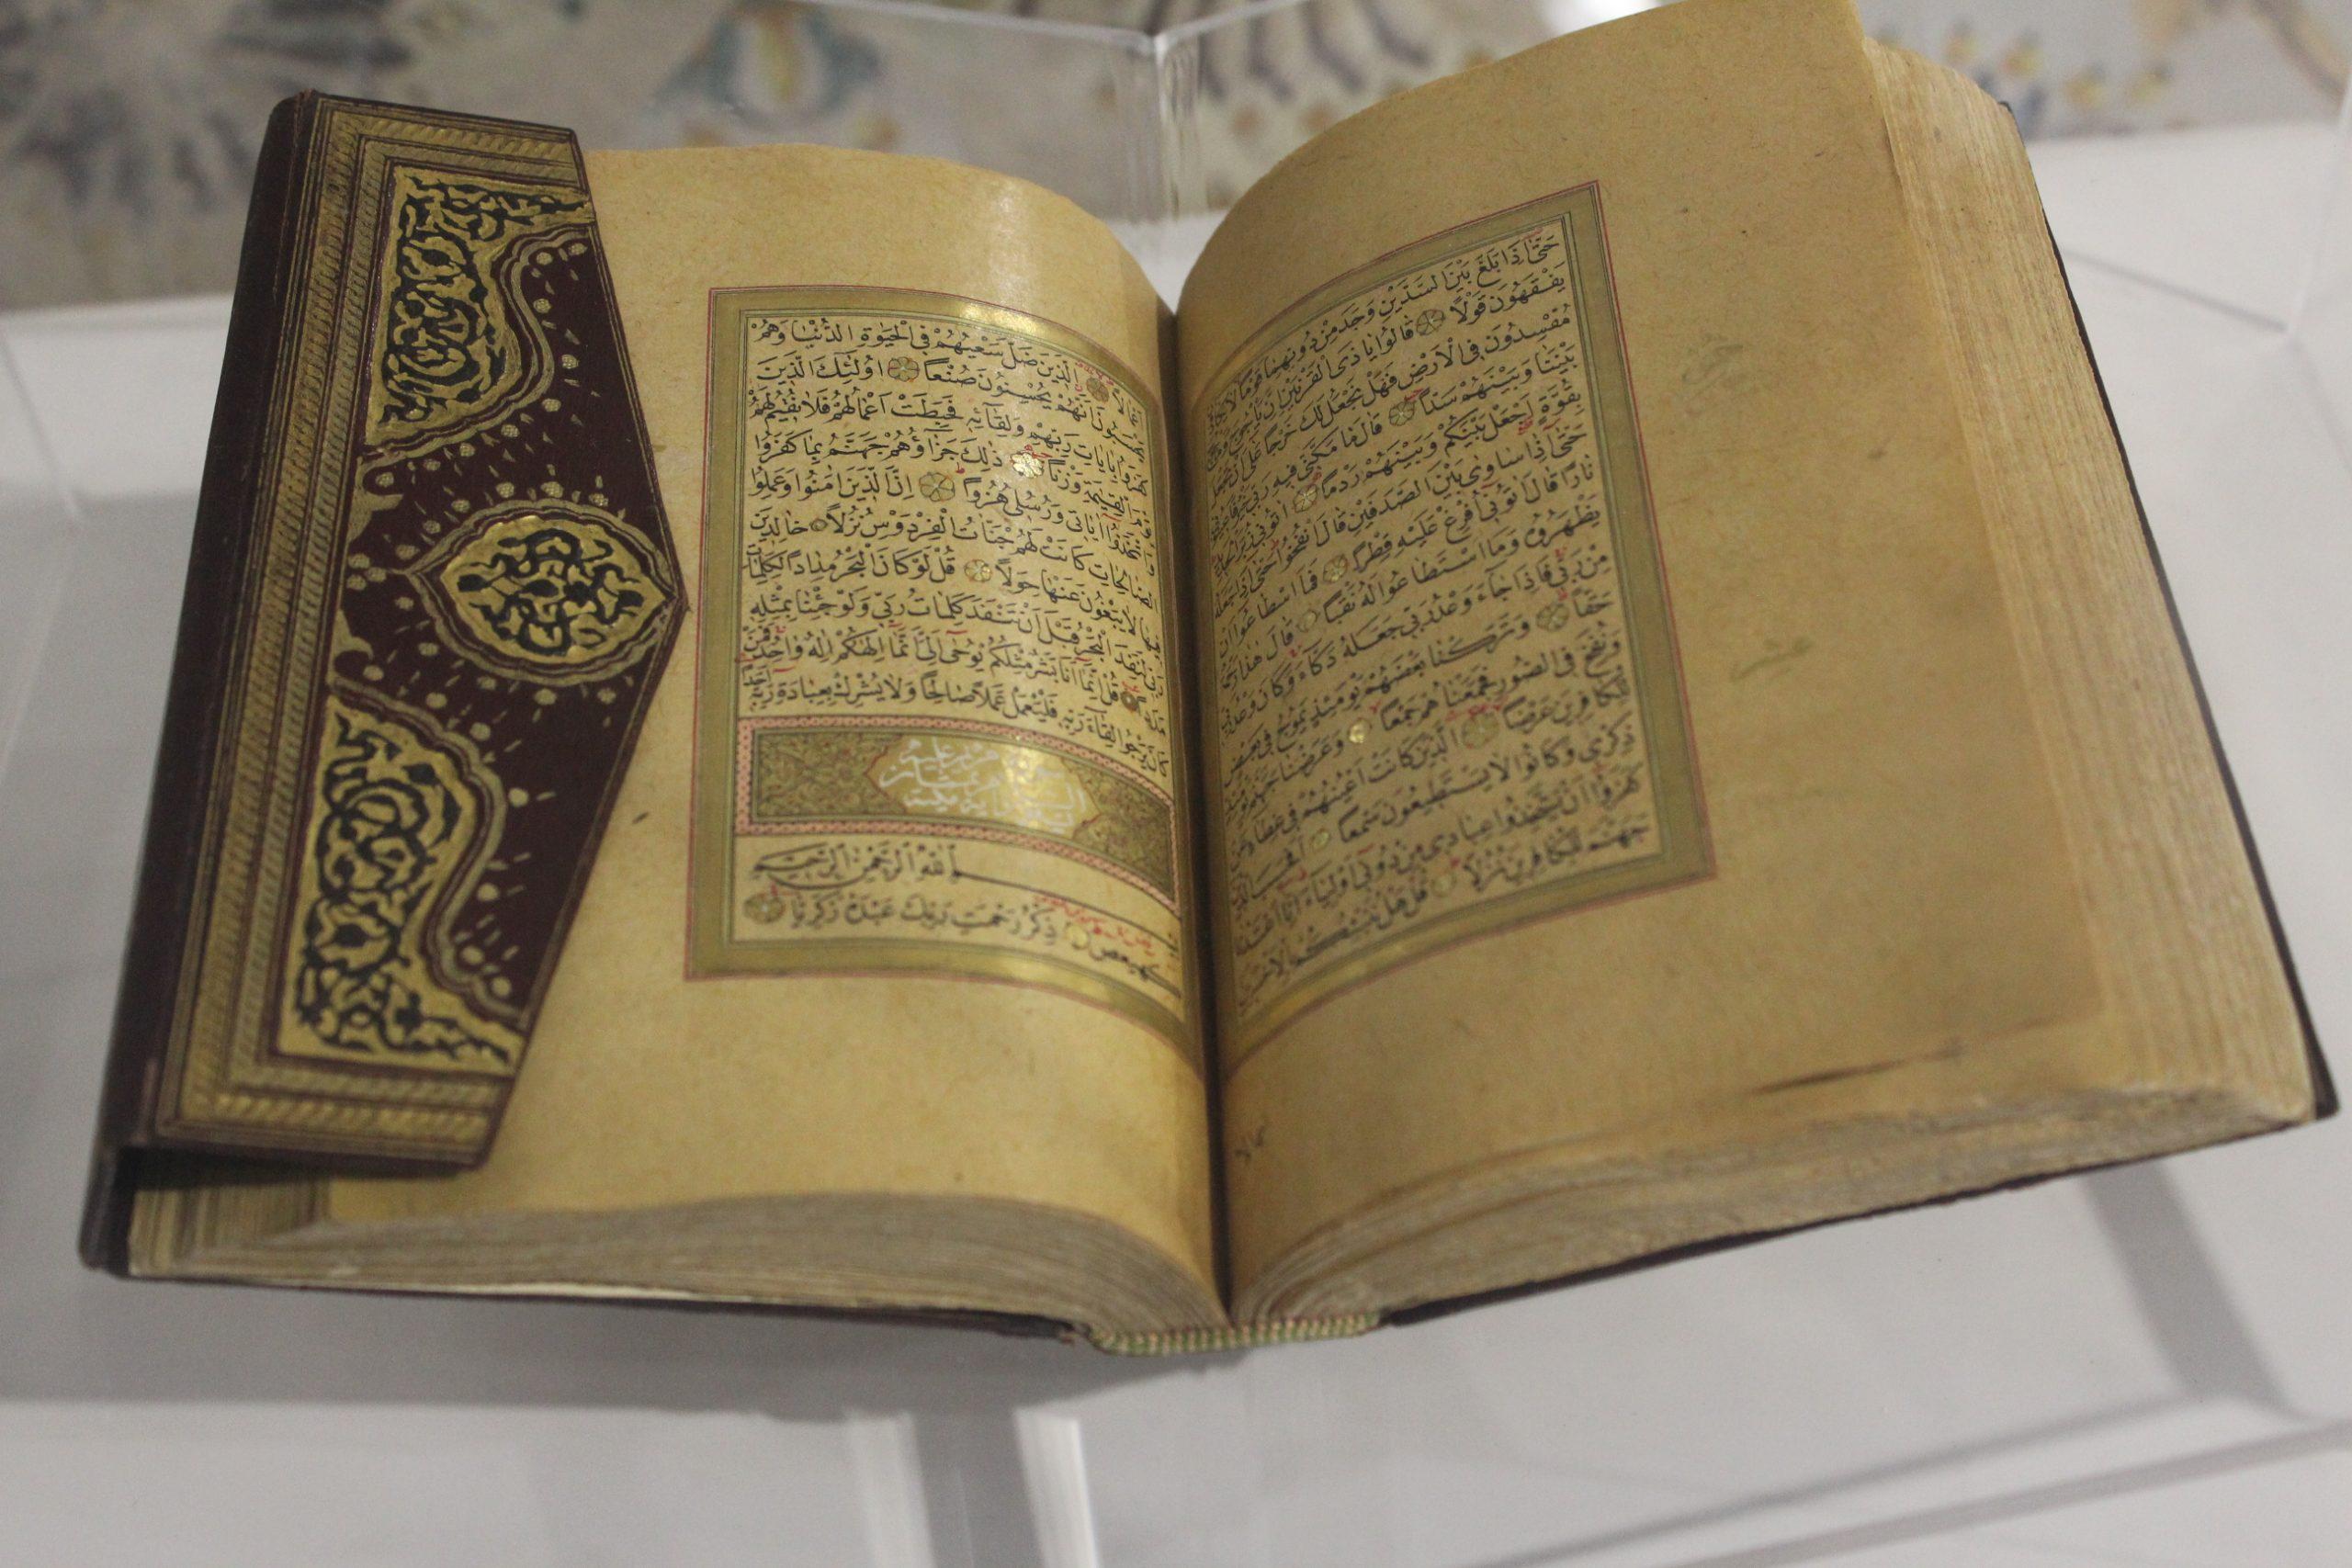 Photo of مؤسسات دينية: مدرسة العلوم الإسلامية بالدار البيضاء